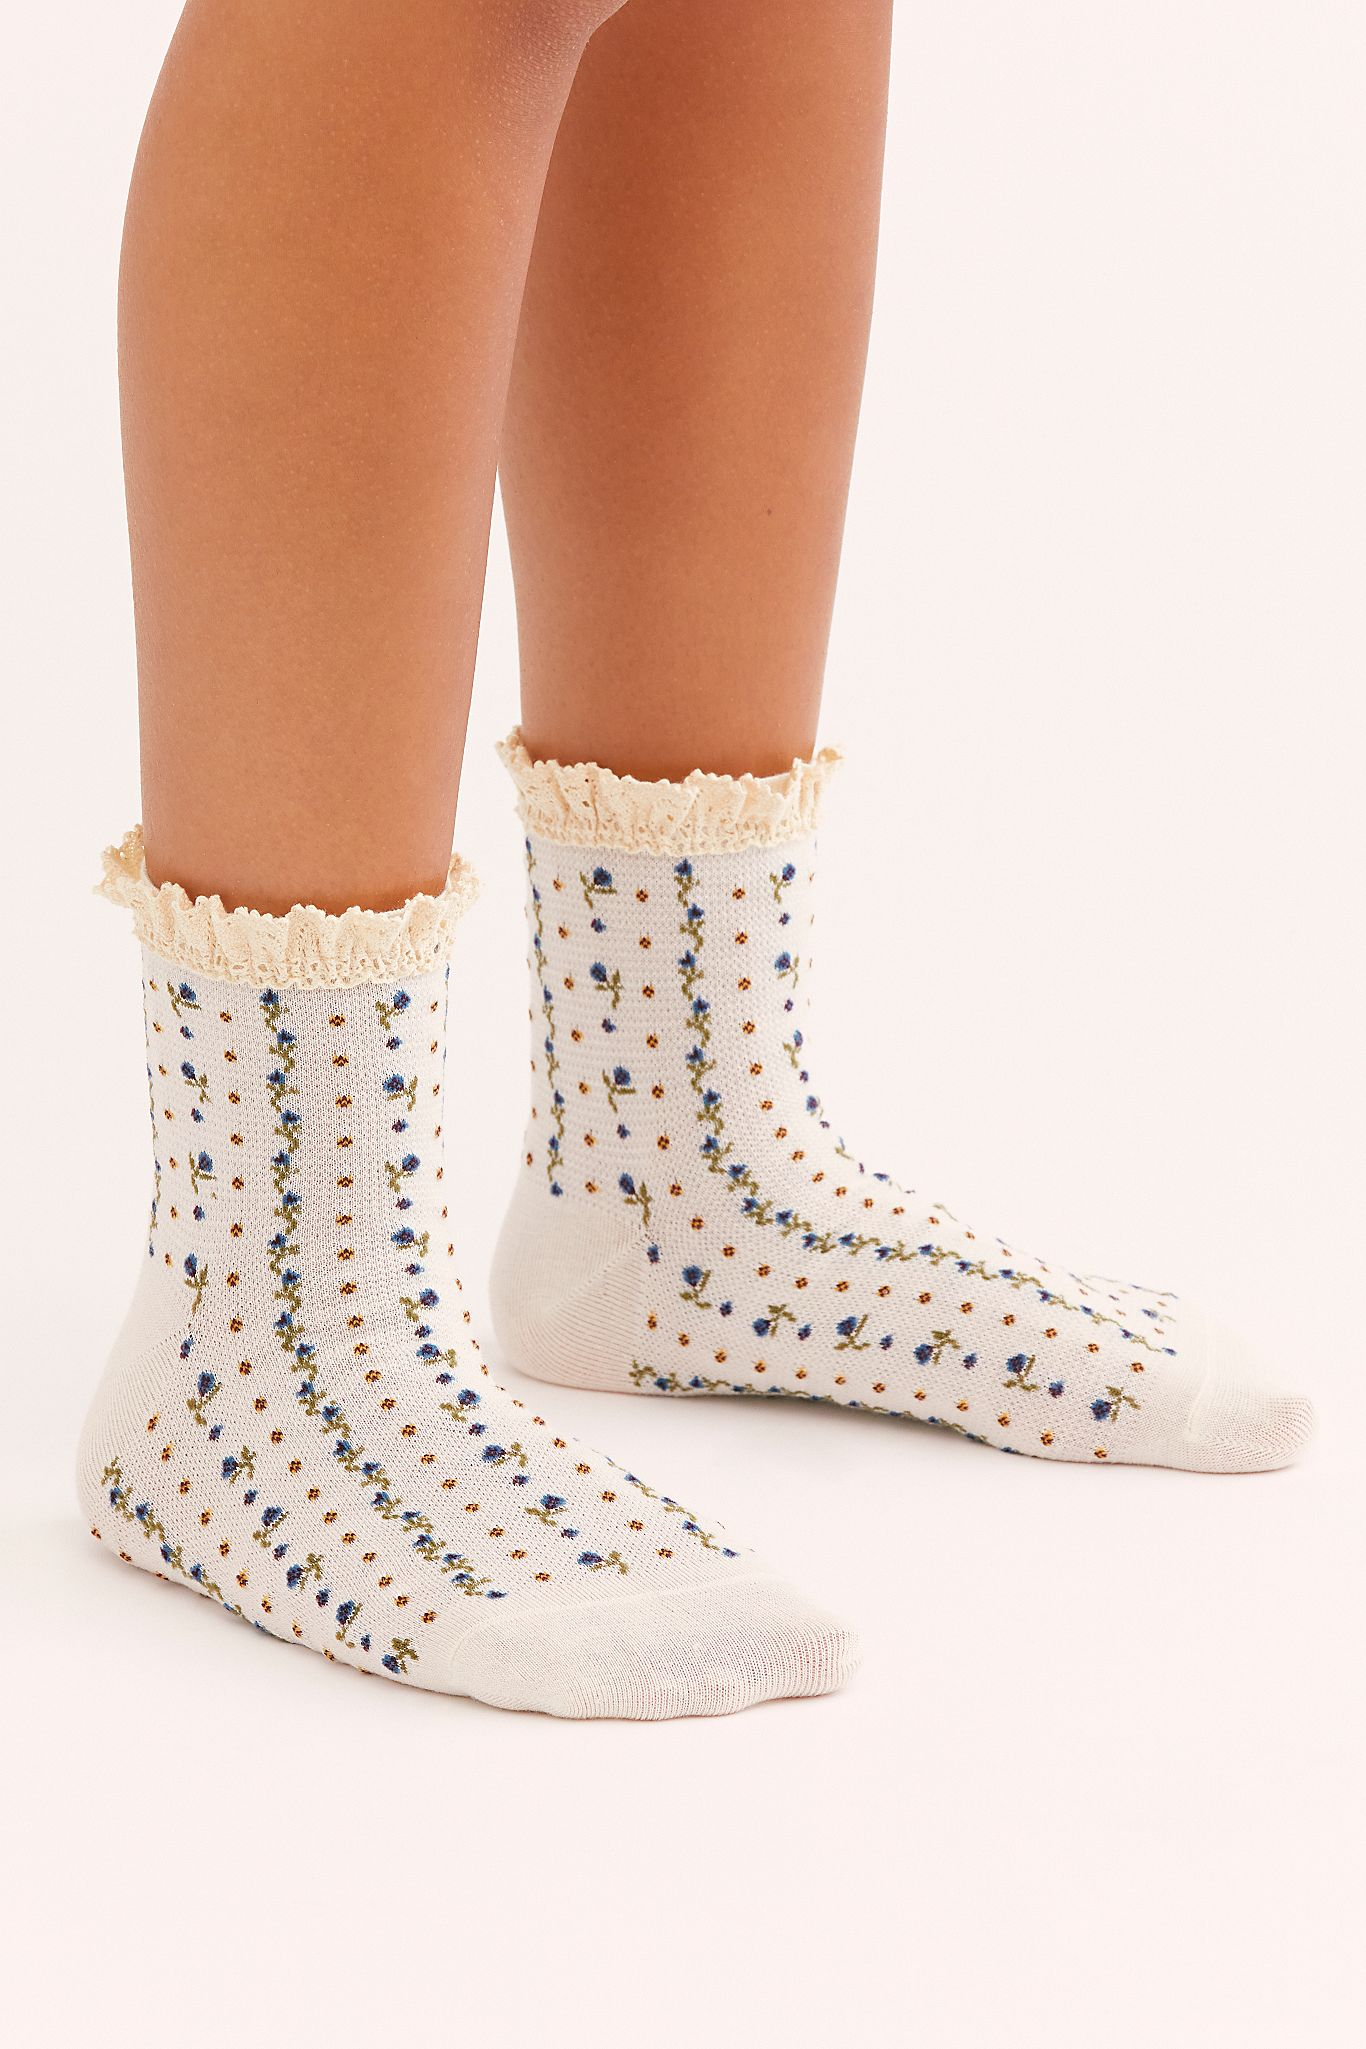 Rosebud Waffle Knit Ankle Socks